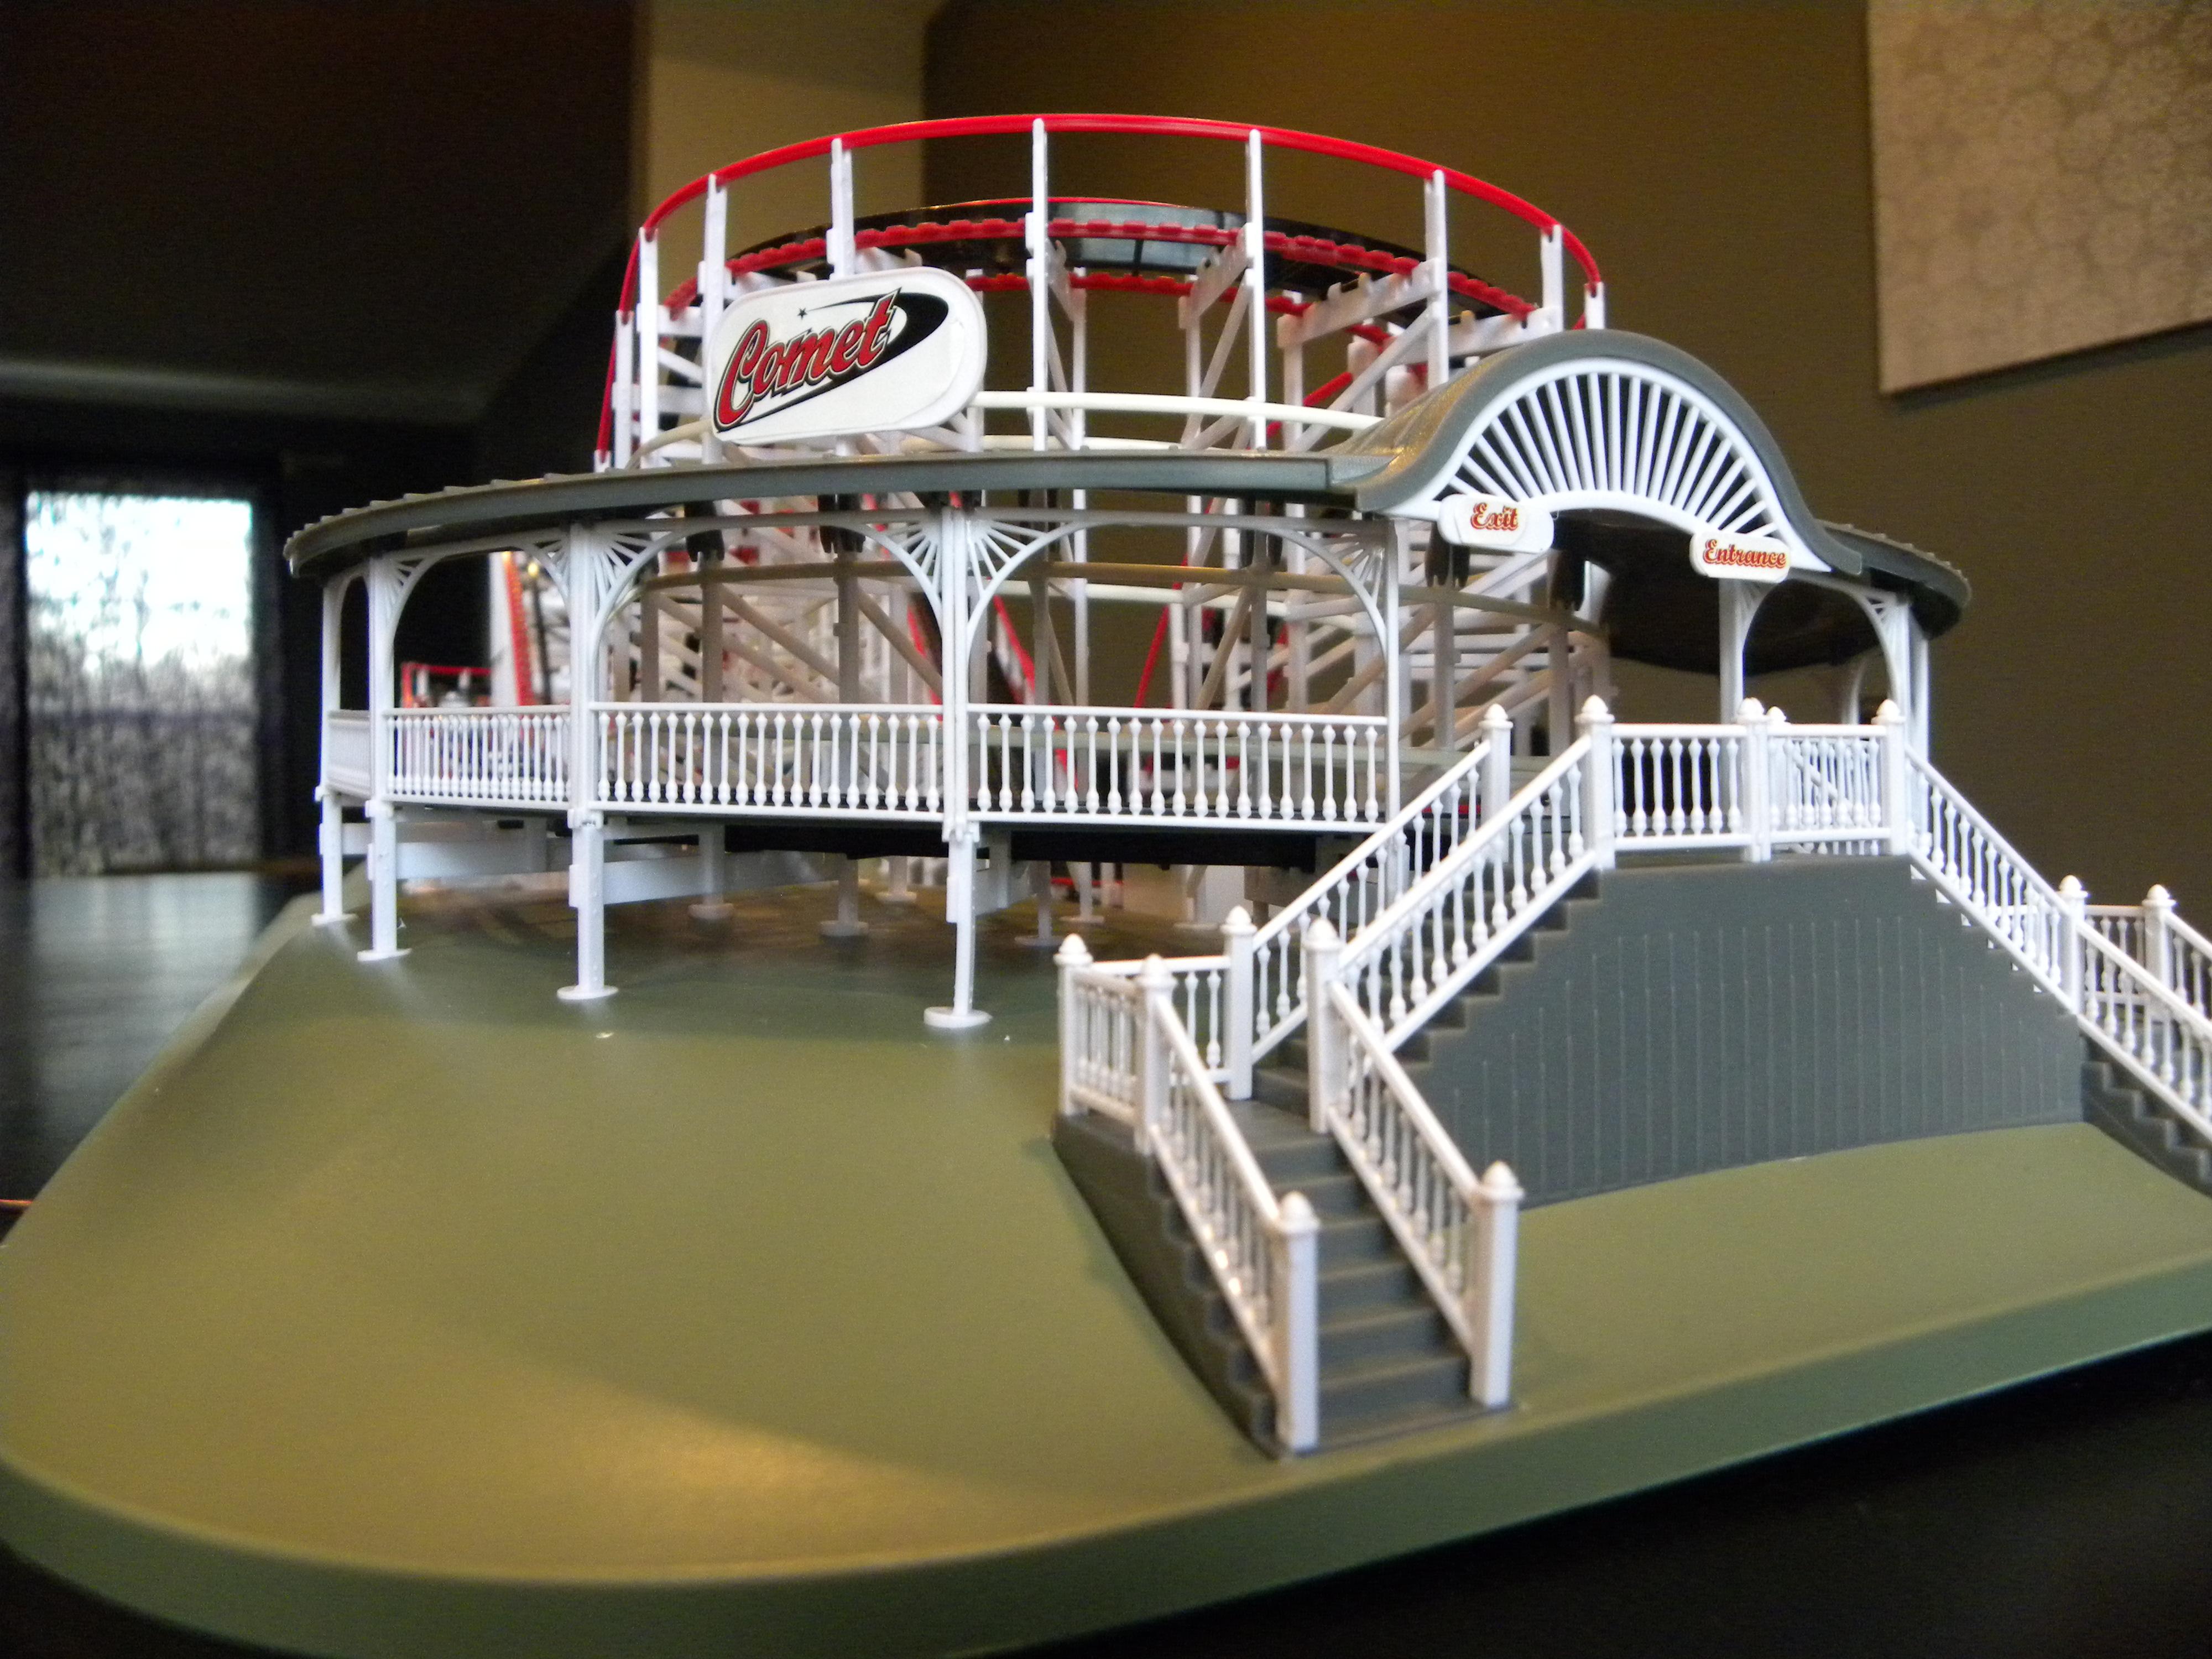 coasterdynamix comet wooden coaster model